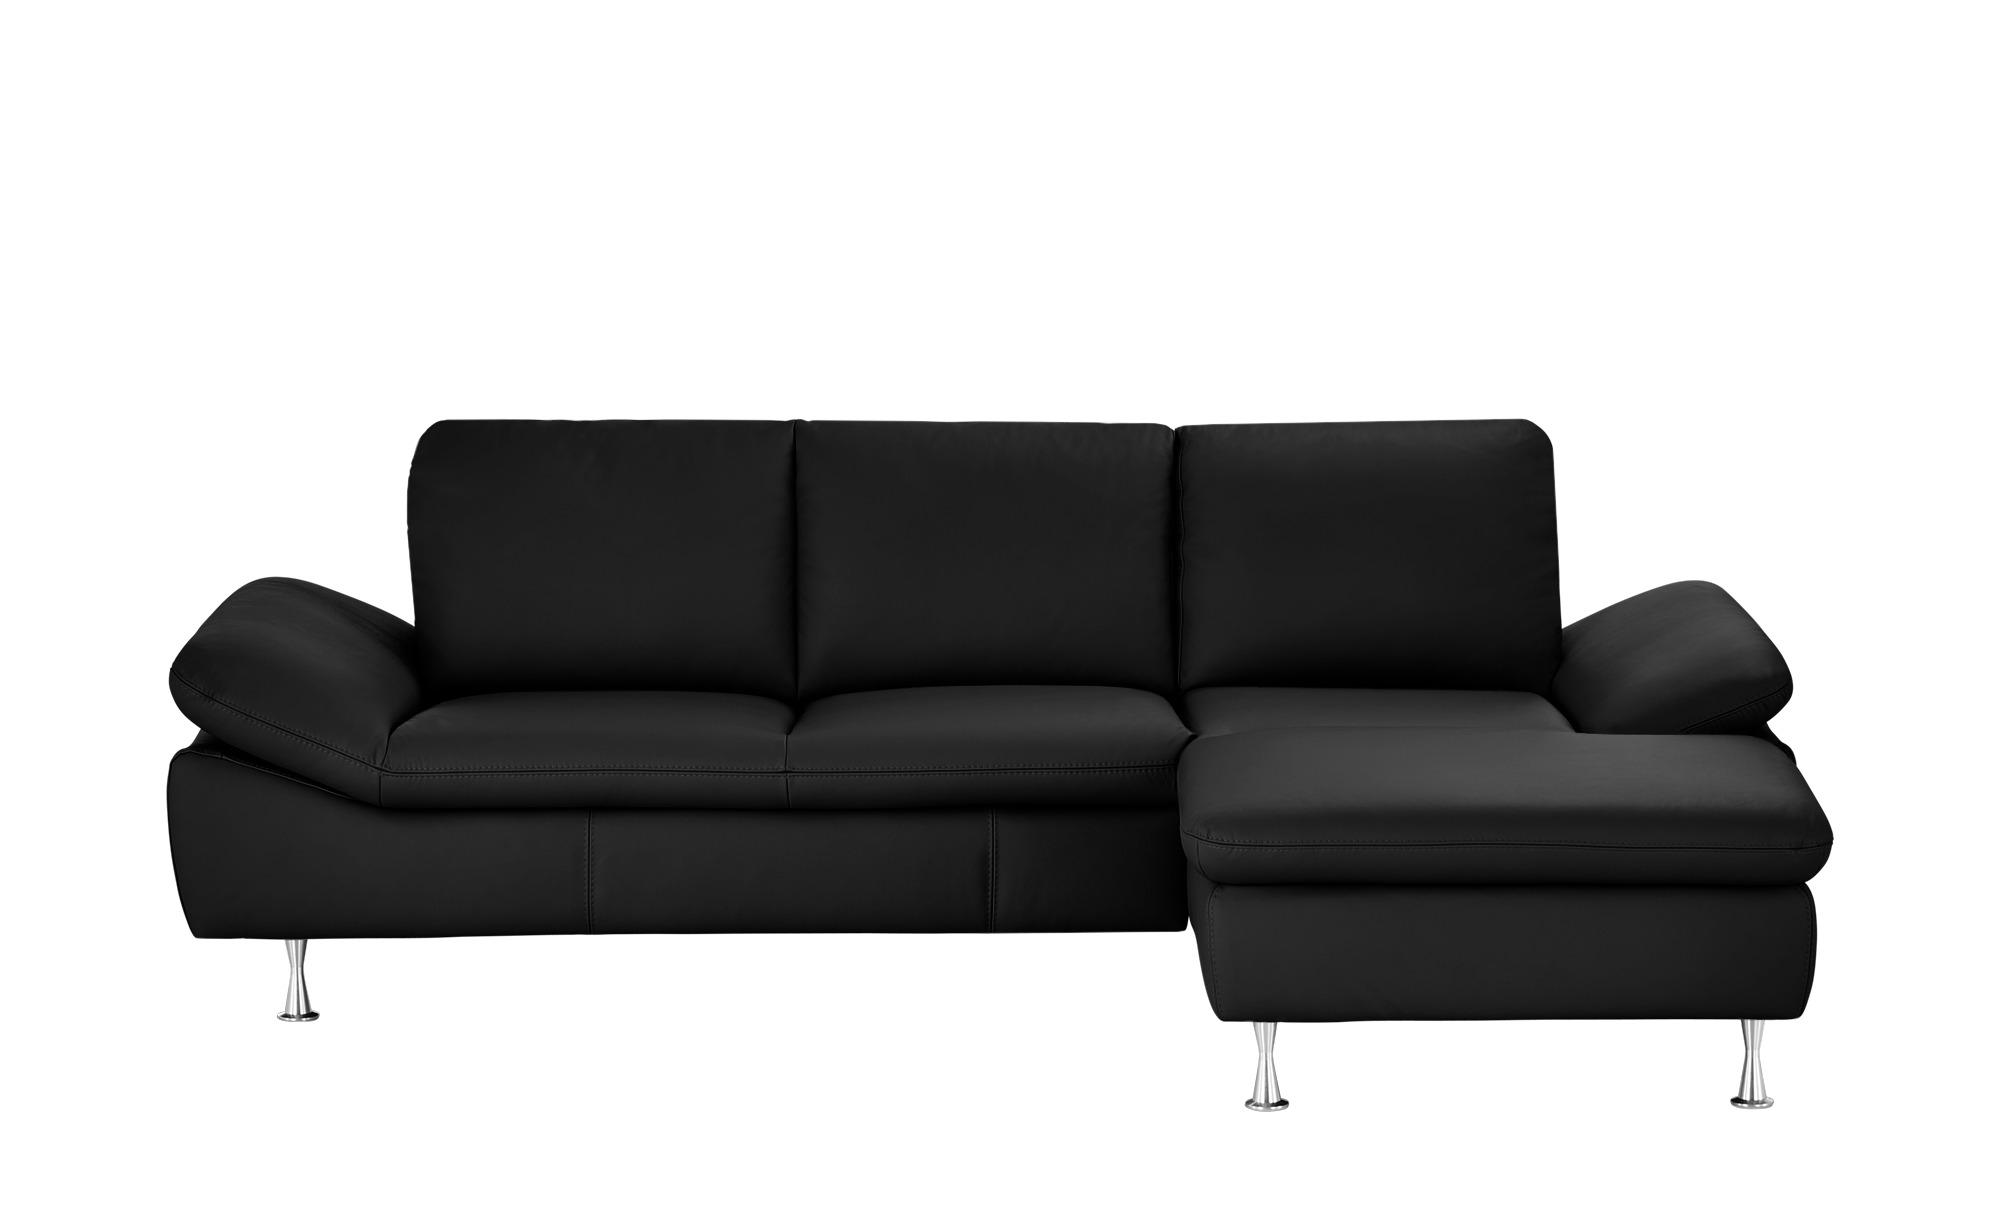 smart Ecksofa schwarz - Leder Okelani ¦ Maße (cm): H: 78 Polstermöbel > Sofas > Ecksofas - Höffner